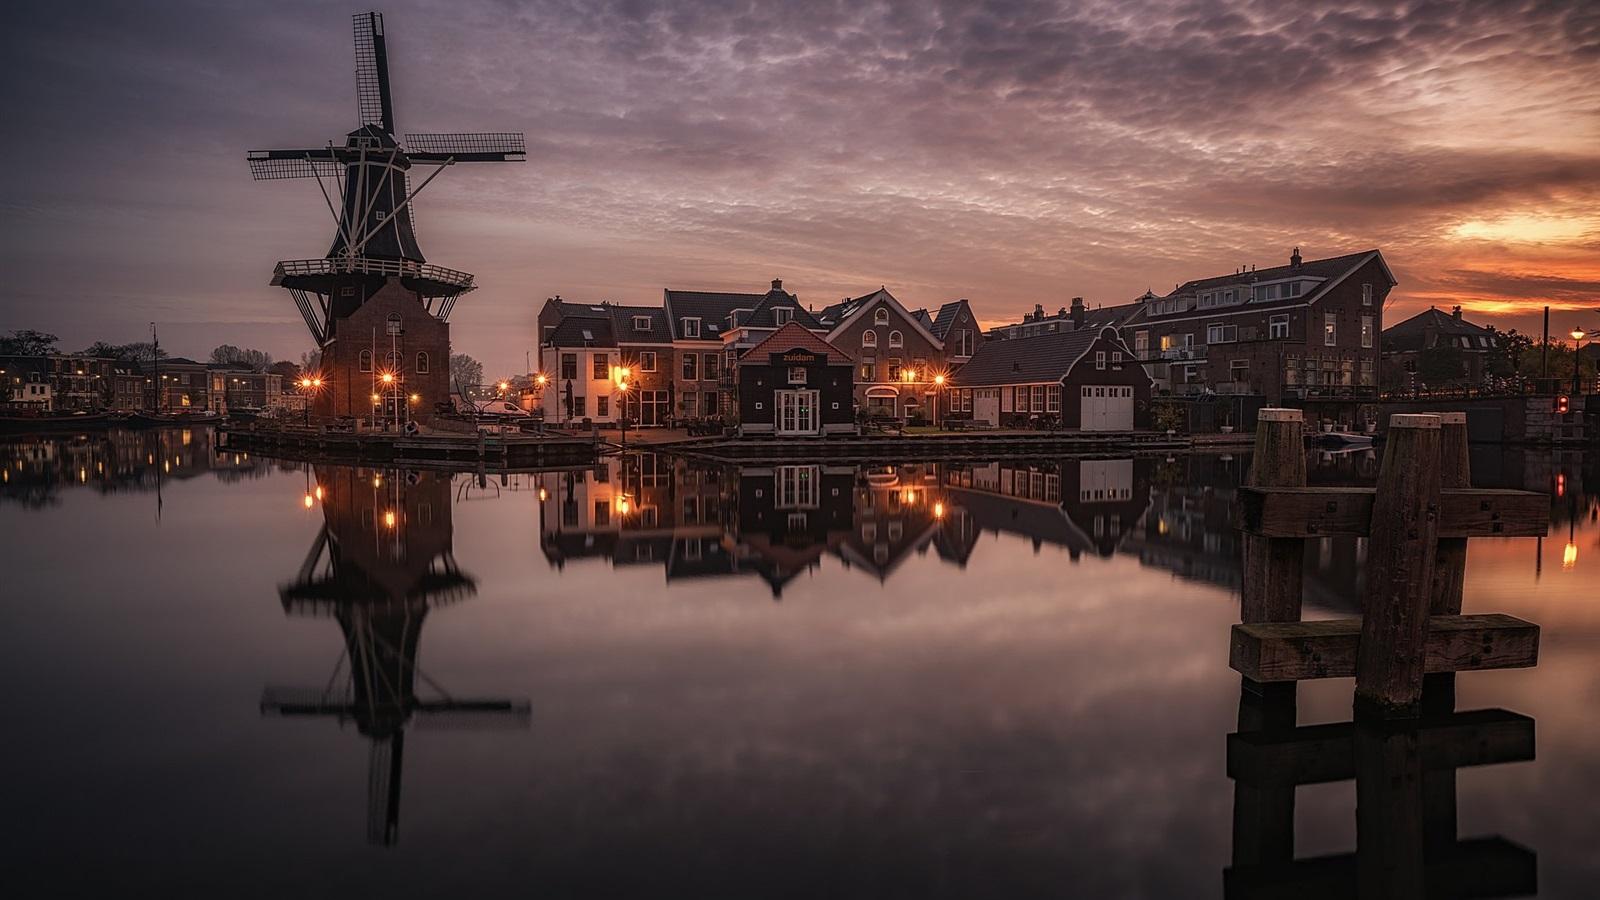 Обои нидерланды, Haarlem, Голландия. Города foto 18